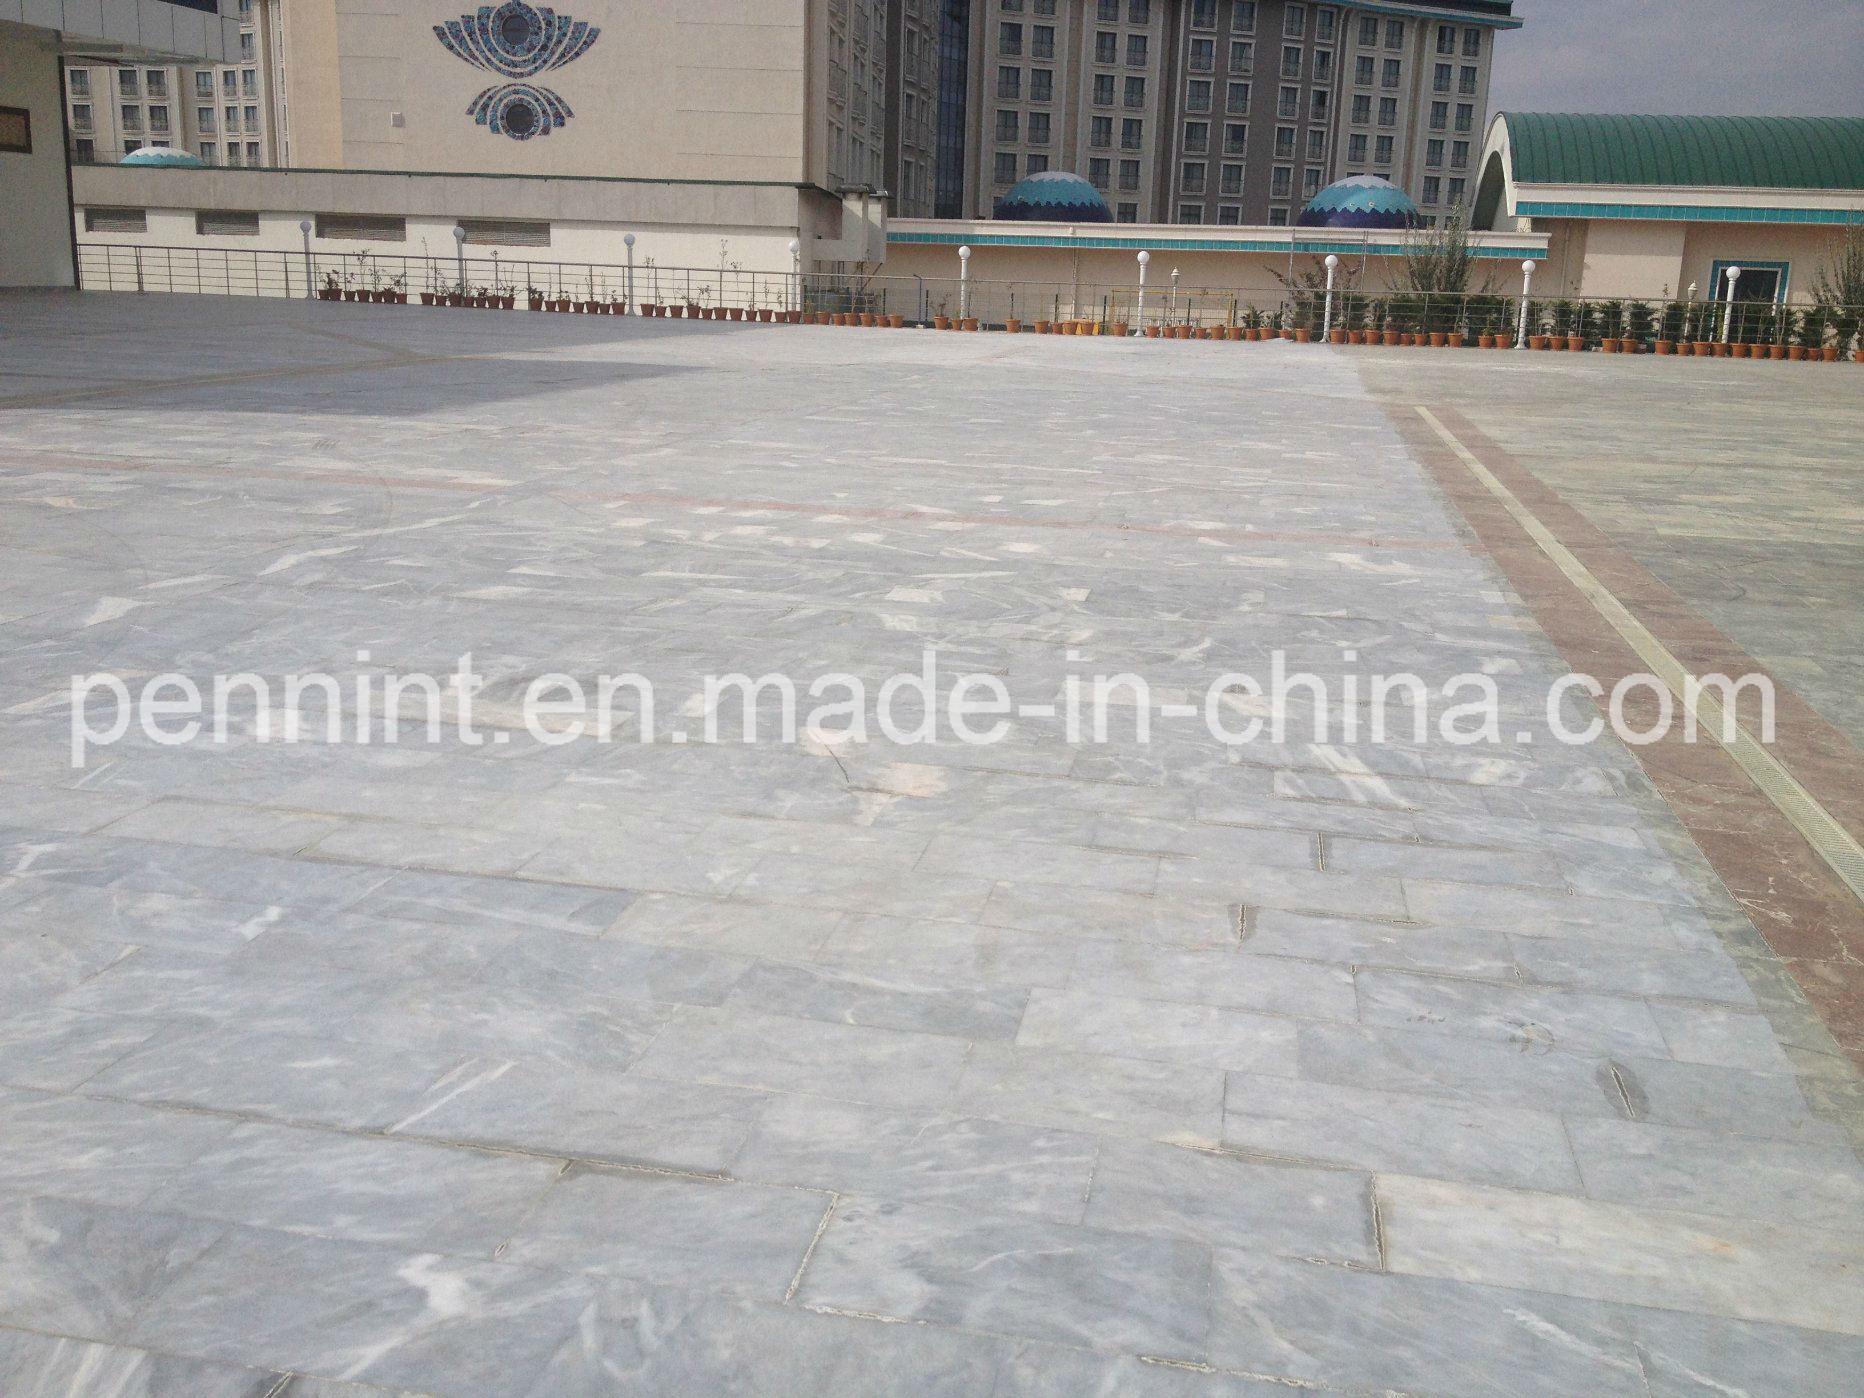 Liquid Polyurethane Waterproof Membrane Roof for Waterproof Coating